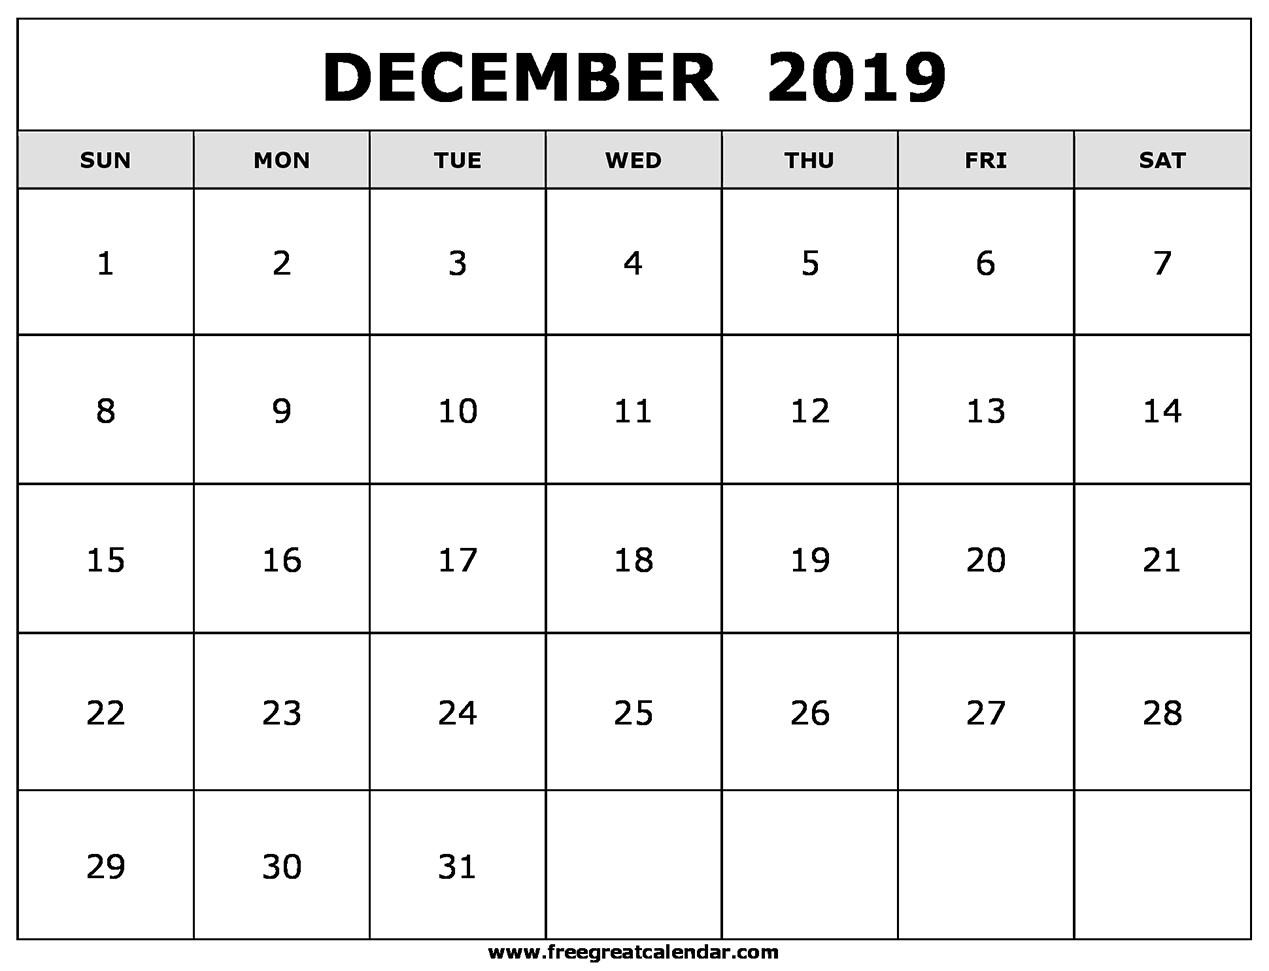 December Calendar 2019 Printable Blank December 2019 Calendar Printable